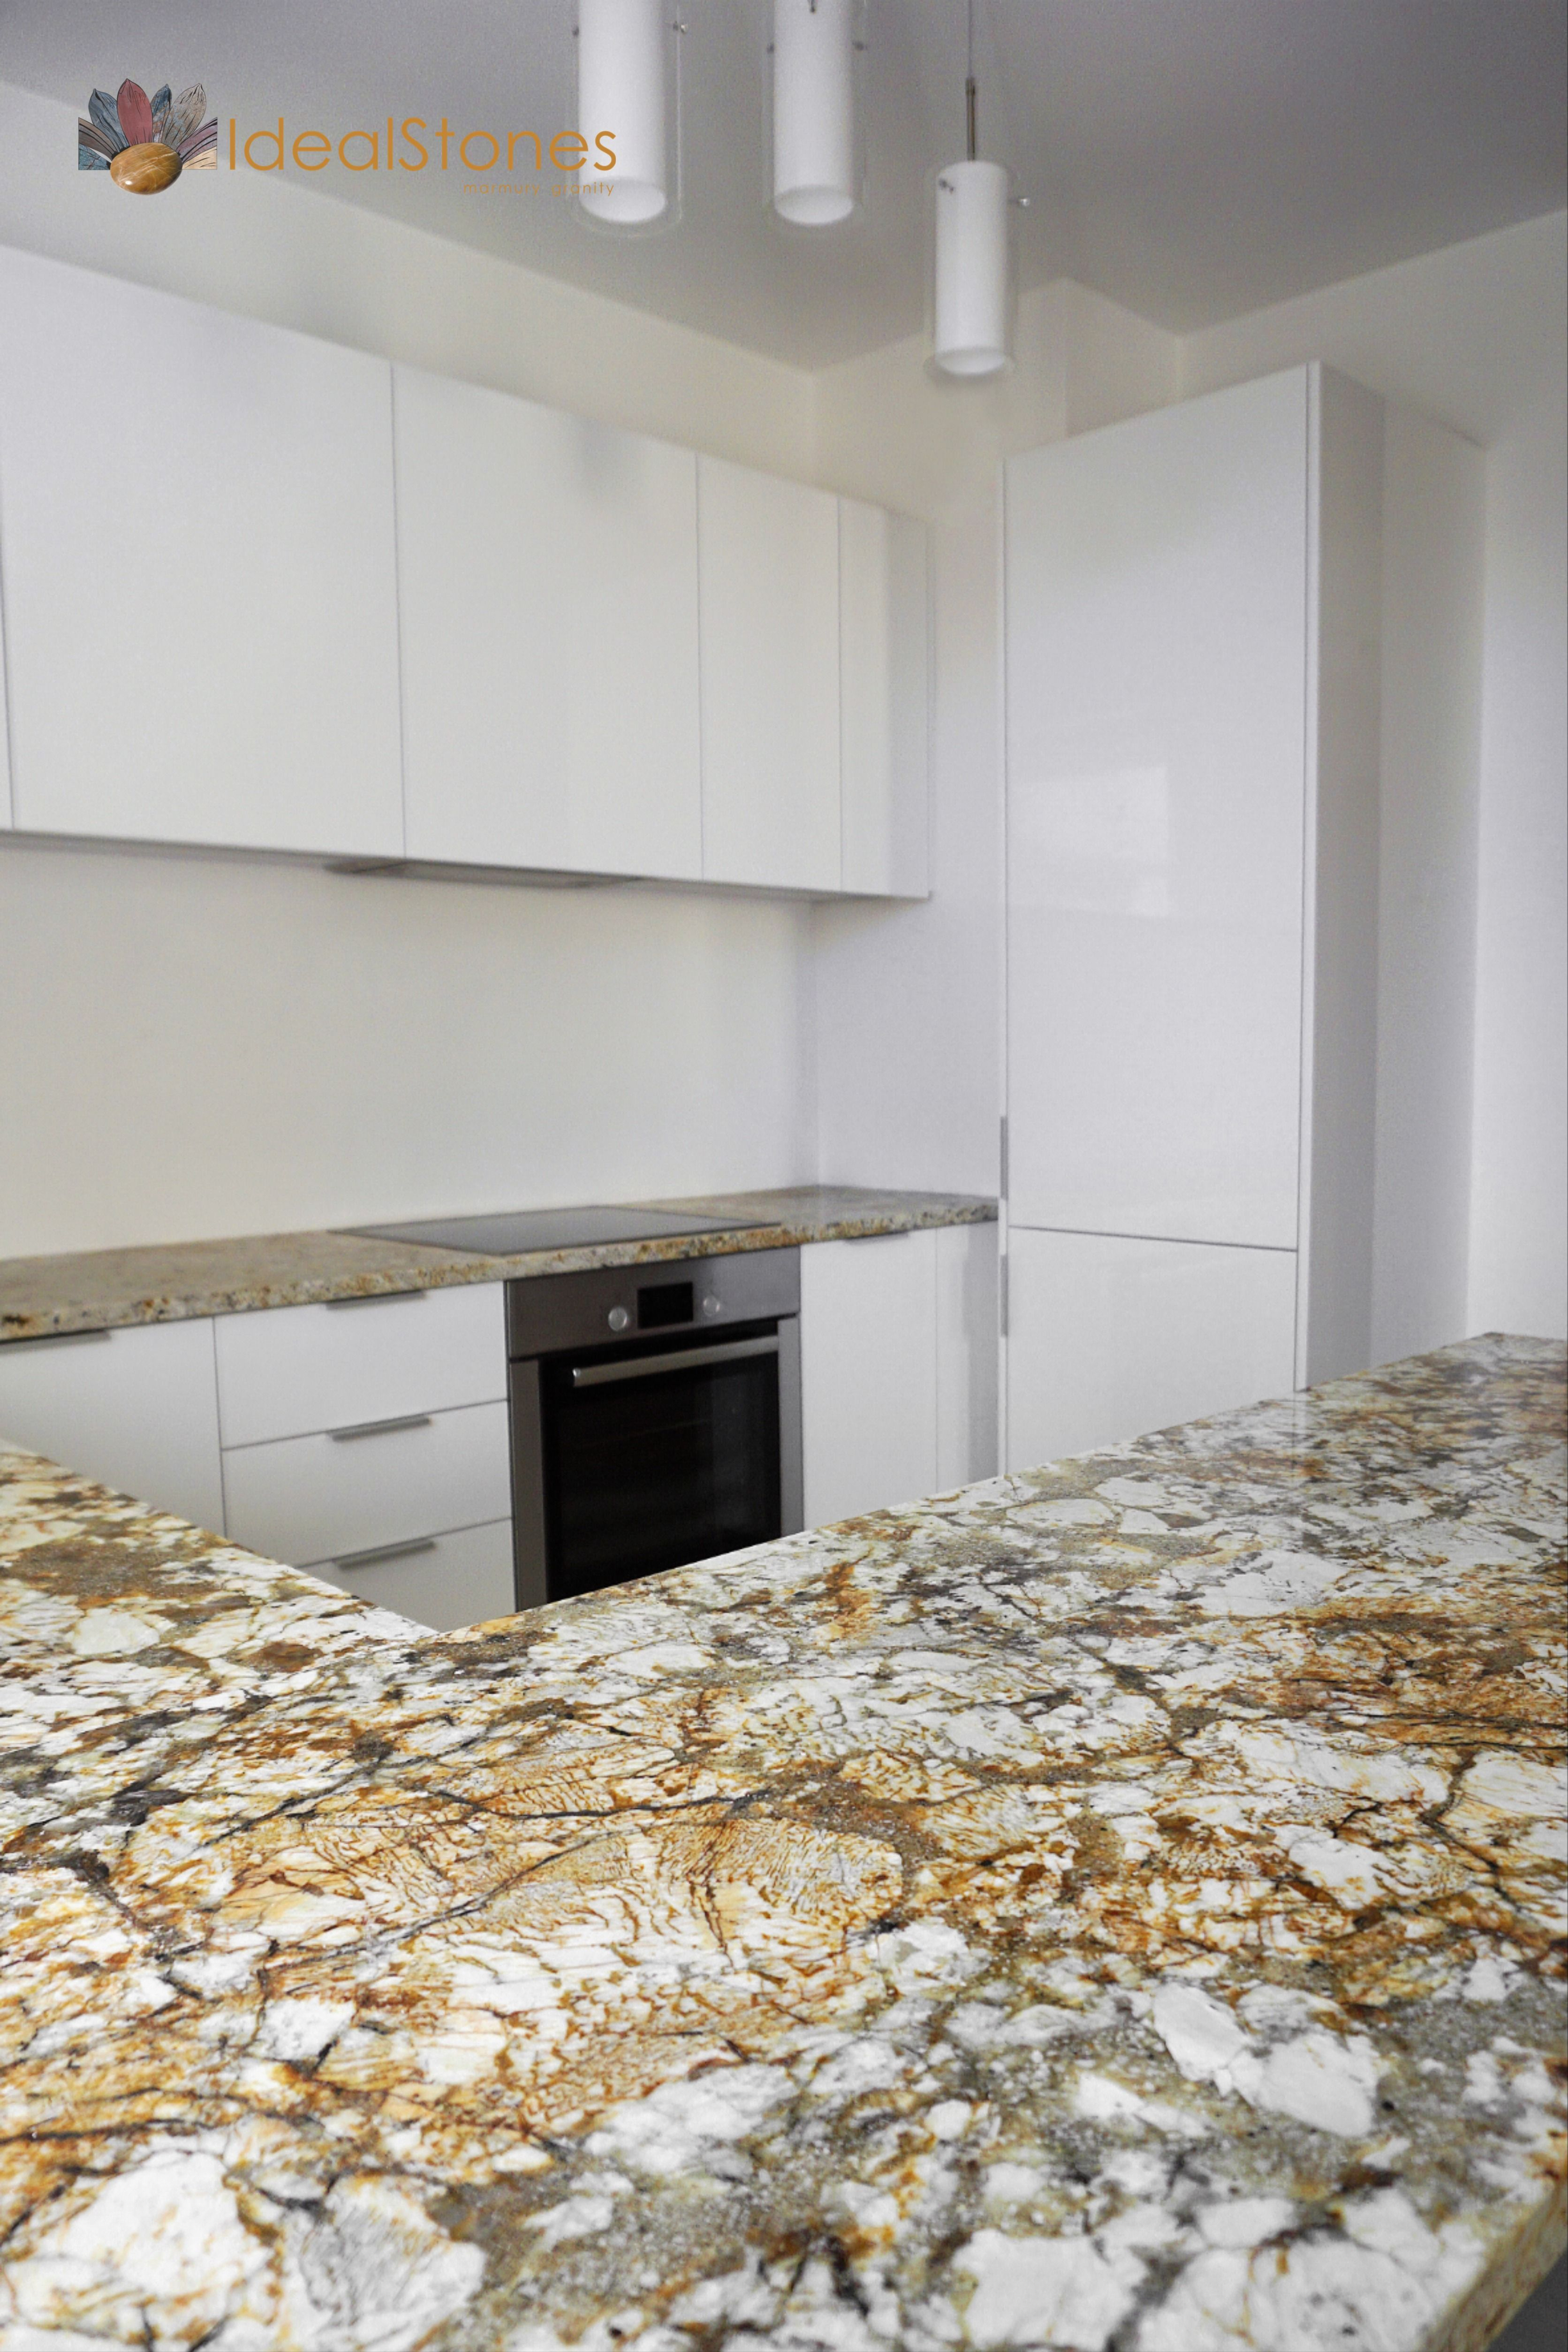 Blat Kamienny Granitowy W Kuchni Kitchen Kitchen Cabinets Decor